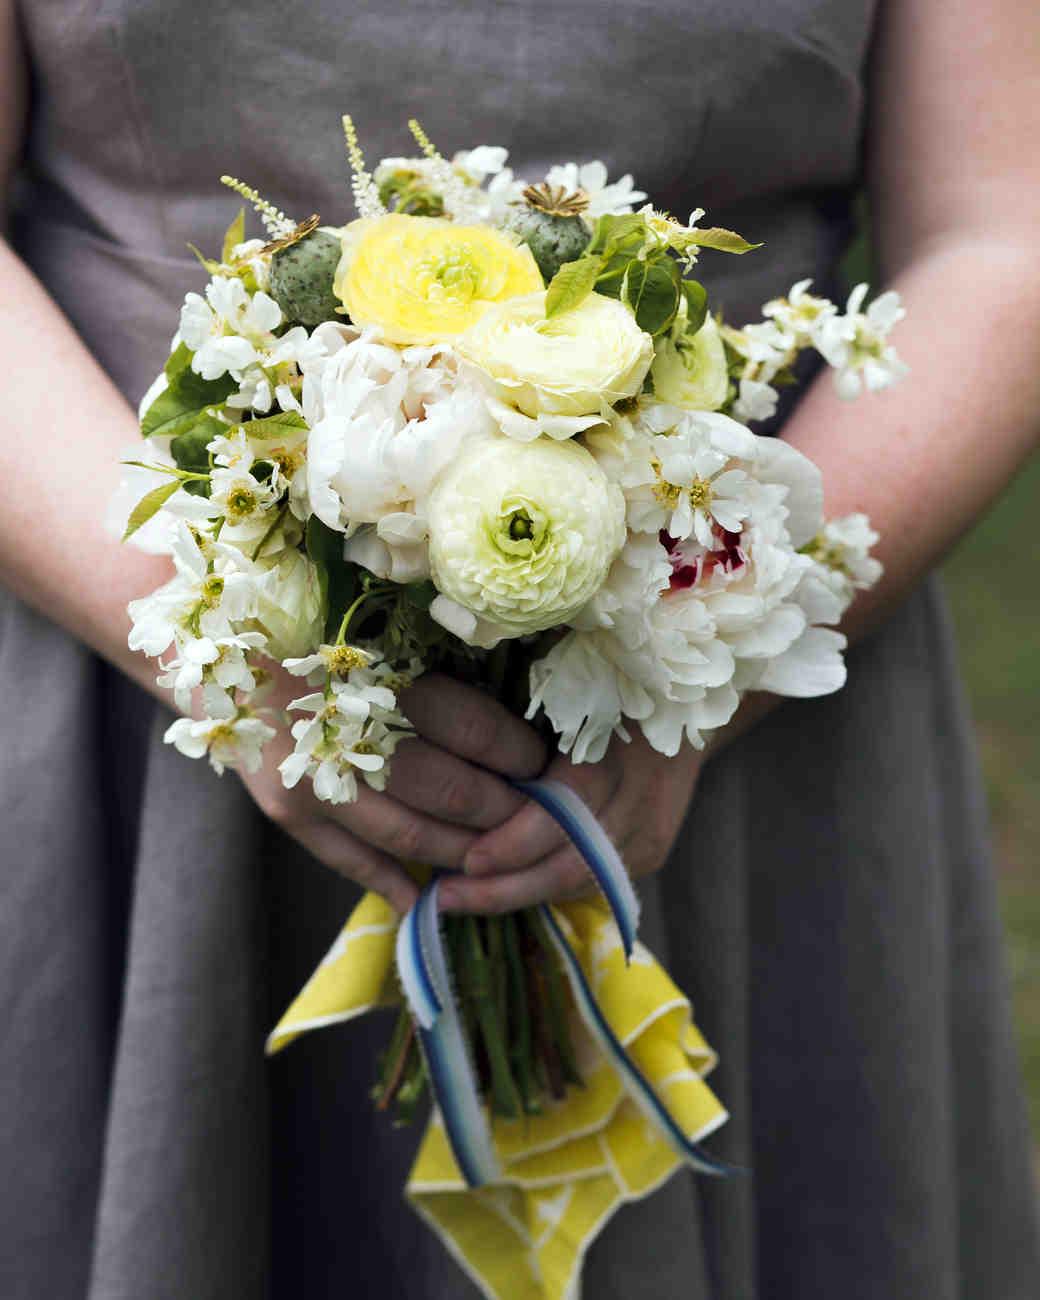 kelly-marie-dave-wedding-bouquet2-0414.jpg